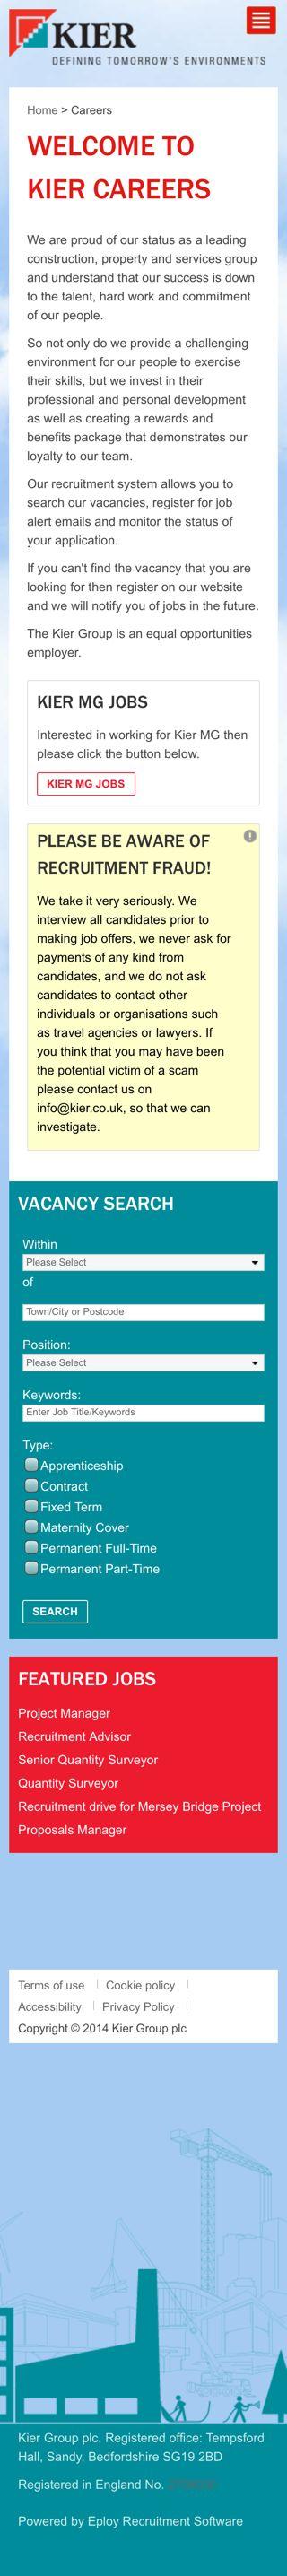 Kier's mobile-responsive candidate portal